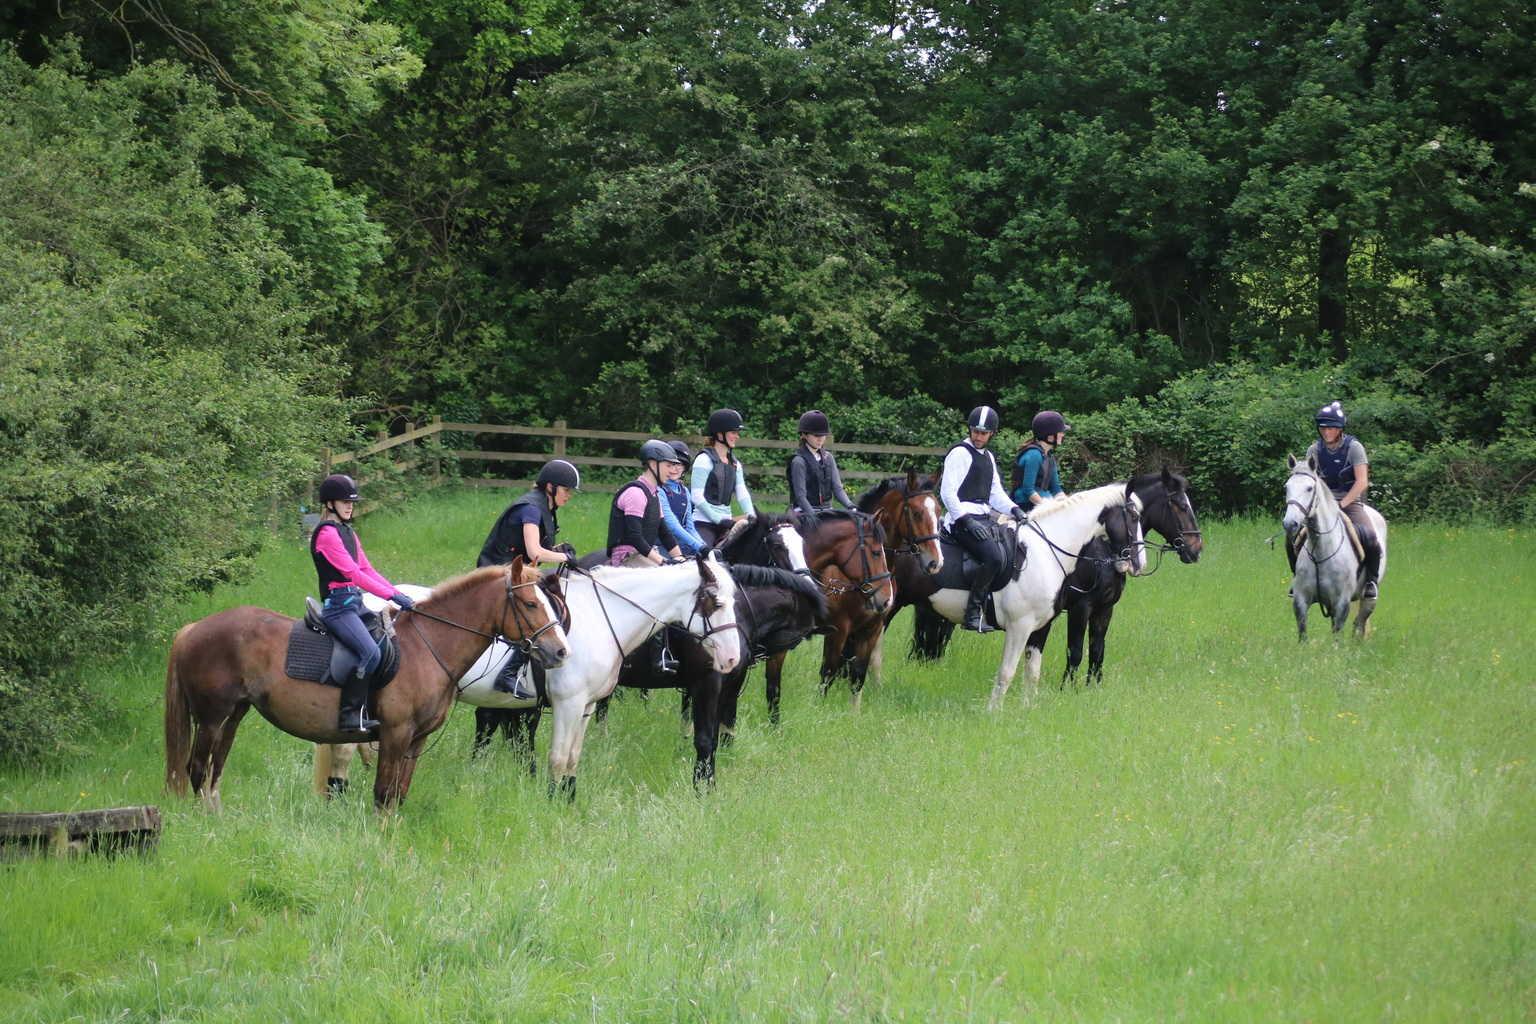 Cross Country / Hacking – Riding Farm Equestrian Centre